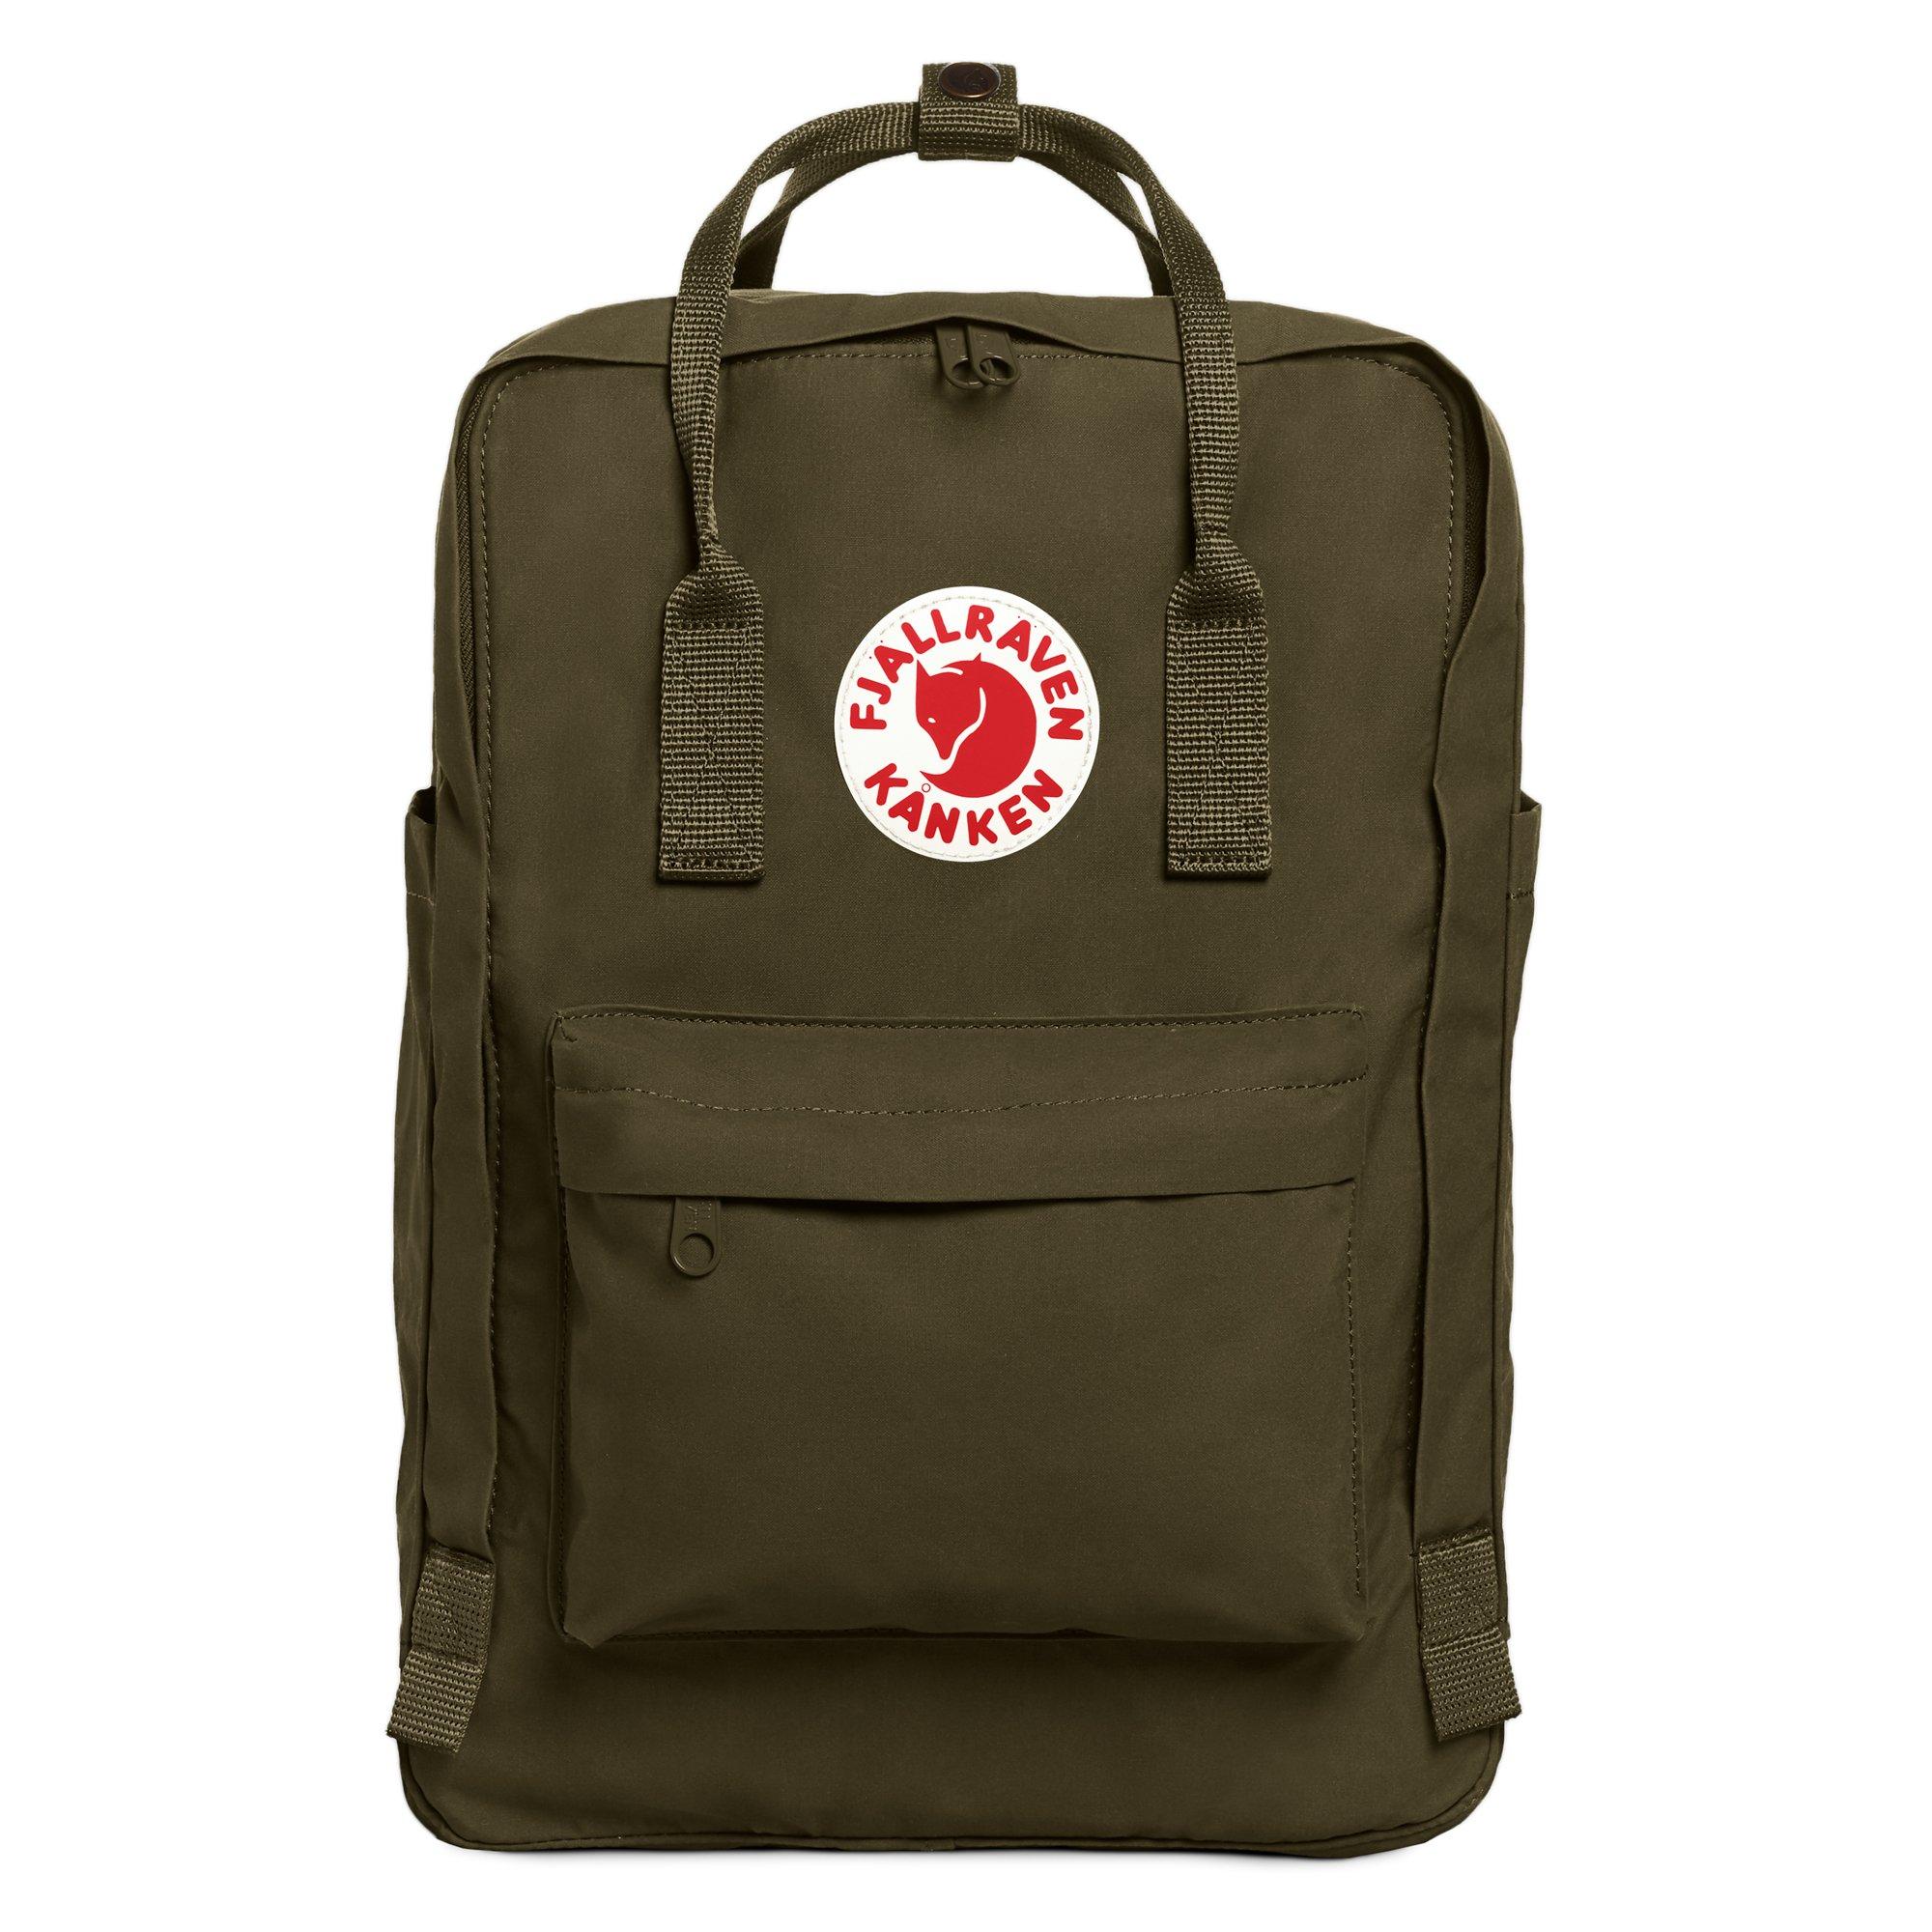 Fjallraven - Kanken Laptop 15'' Backpack for Everyday, Green by Fjallraven